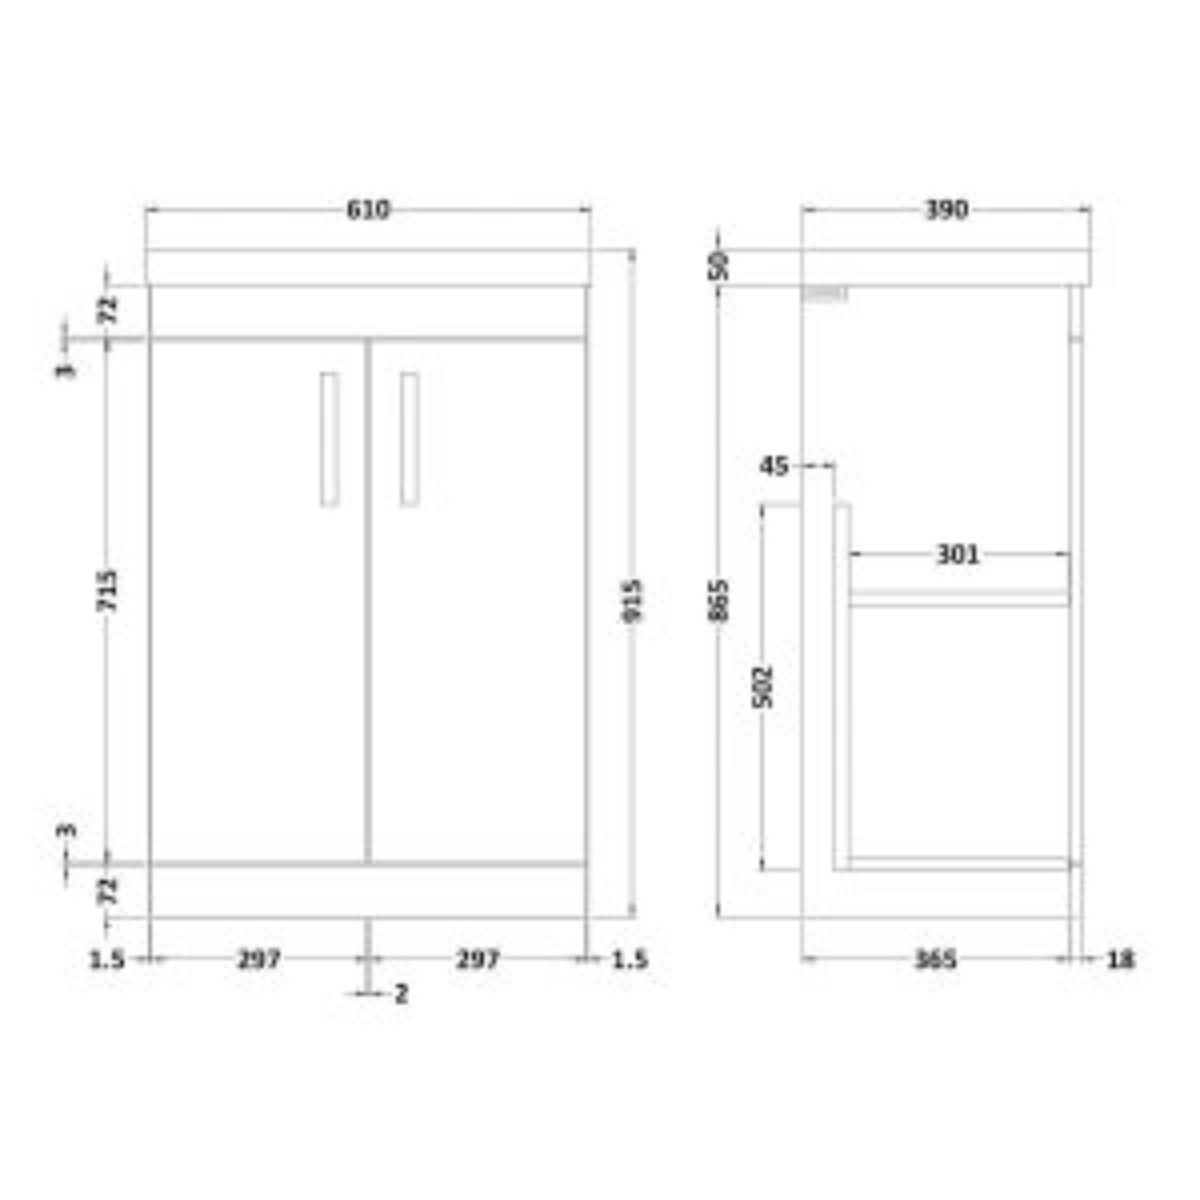 Nuie Athena Gloss Grey Mist 2 Door Floor Standing Vanity Unit with 50mm Profile Basin 600mm Line Drawing